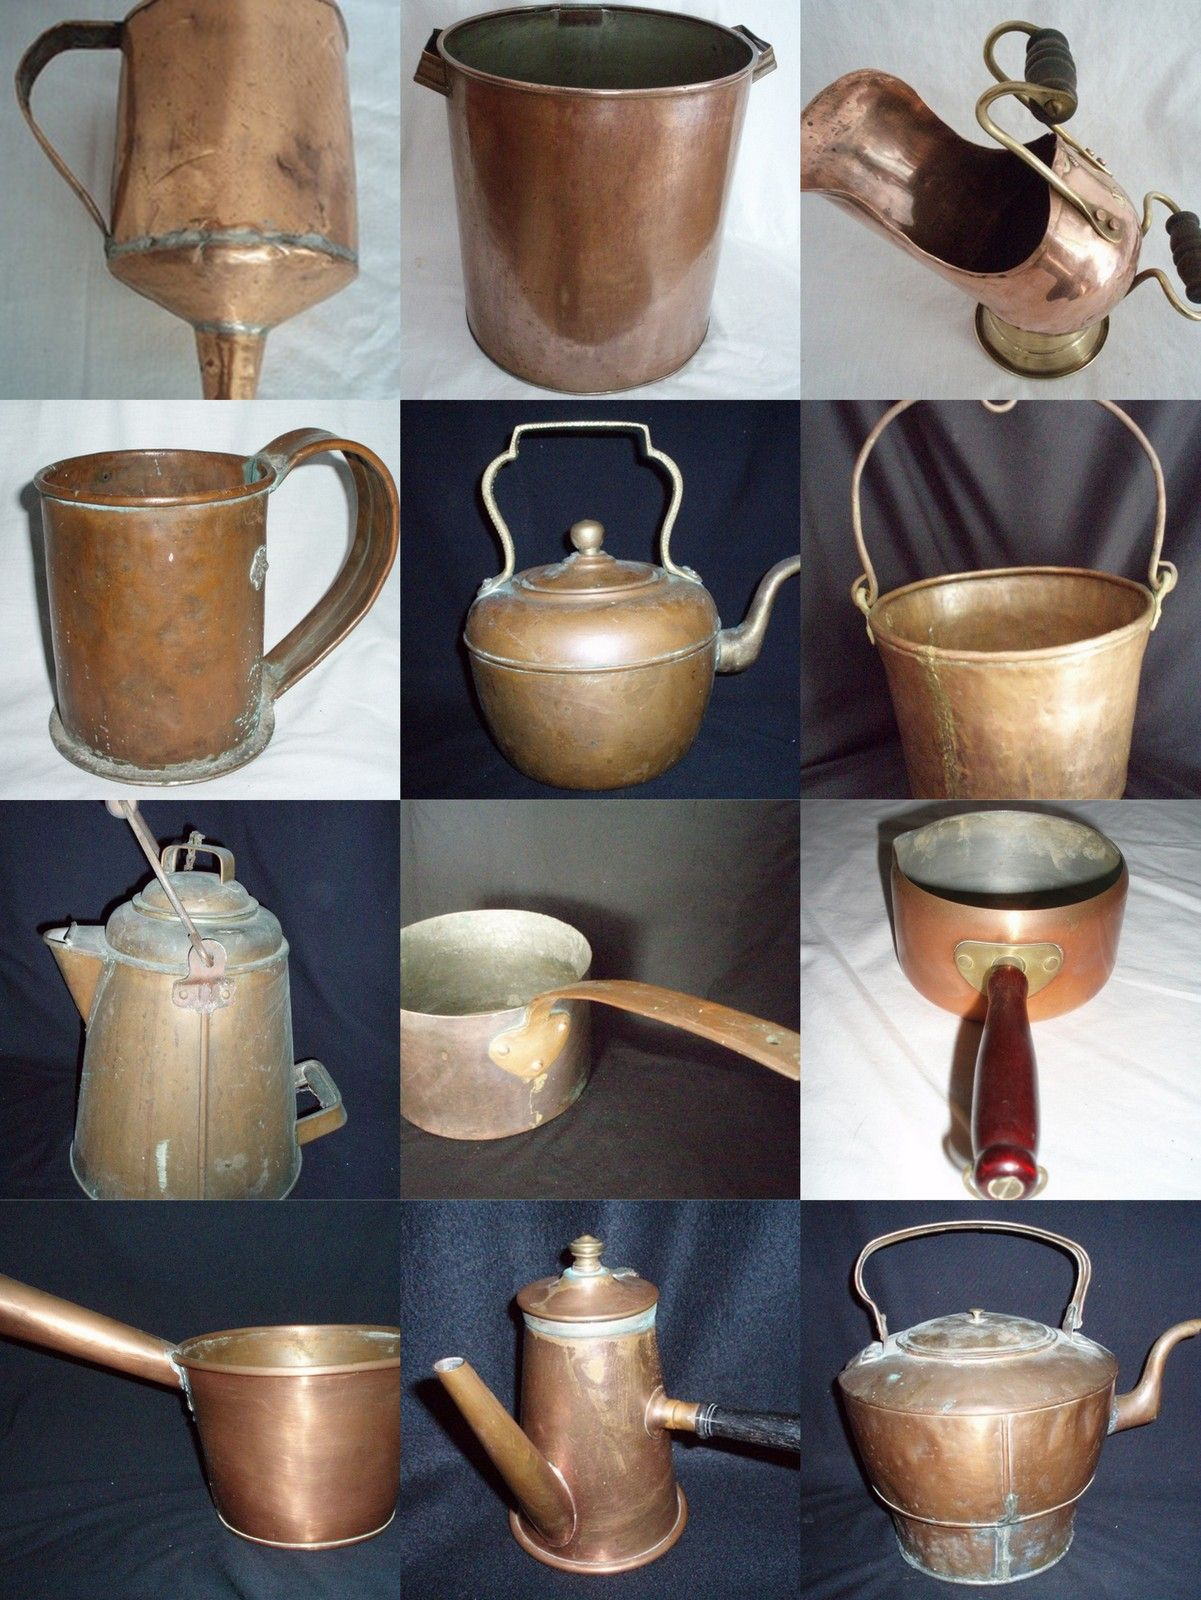 antique copper cookware kettles pots buckets pans. Black Bedroom Furniture Sets. Home Design Ideas